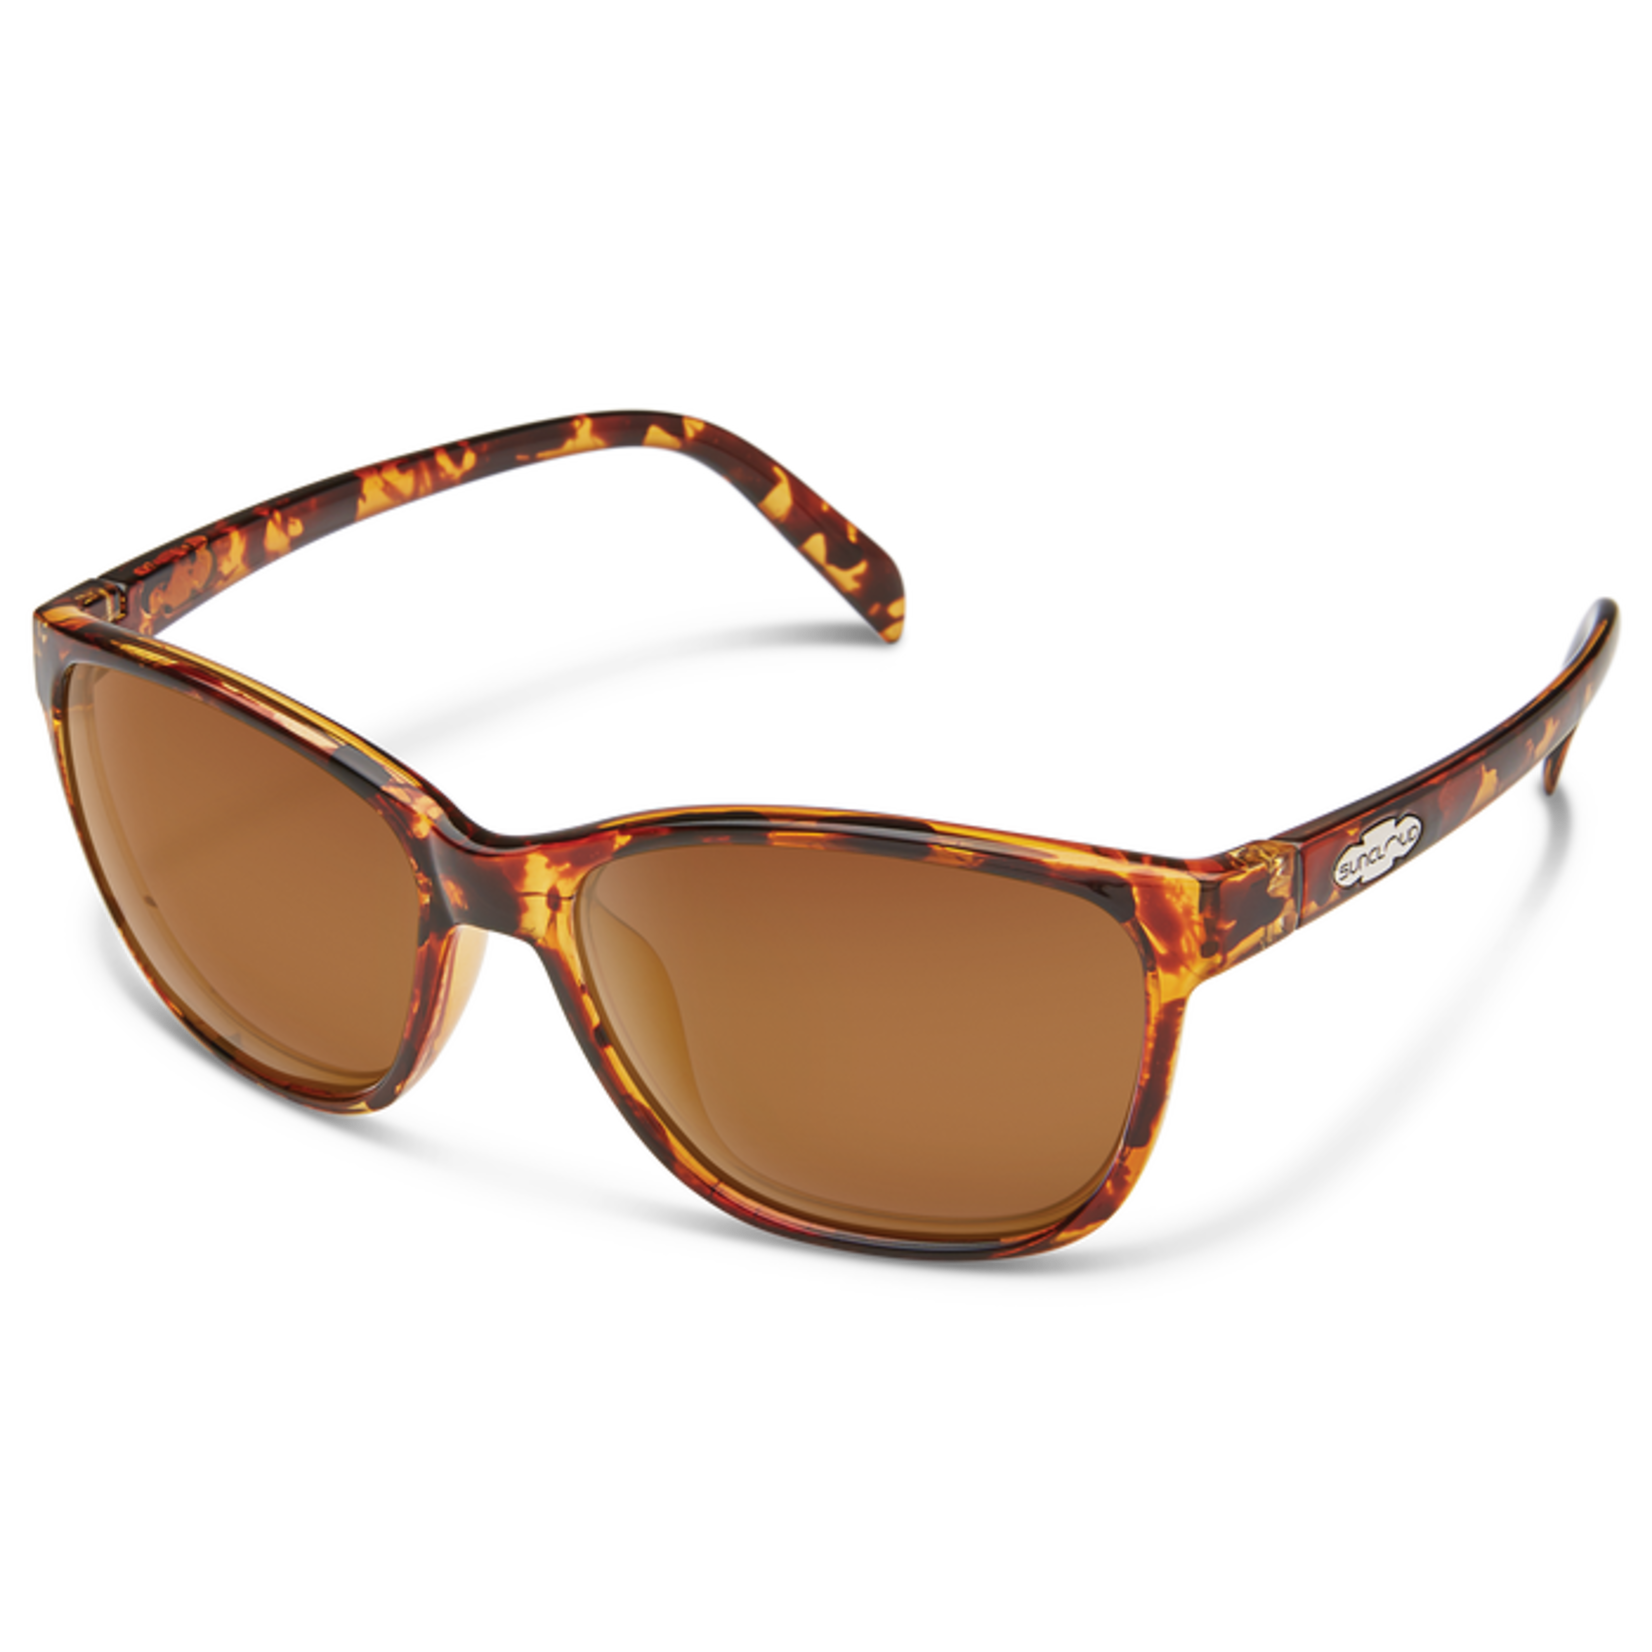 Suncloud Optics Suncloud Dawson Polarized Sunglasses